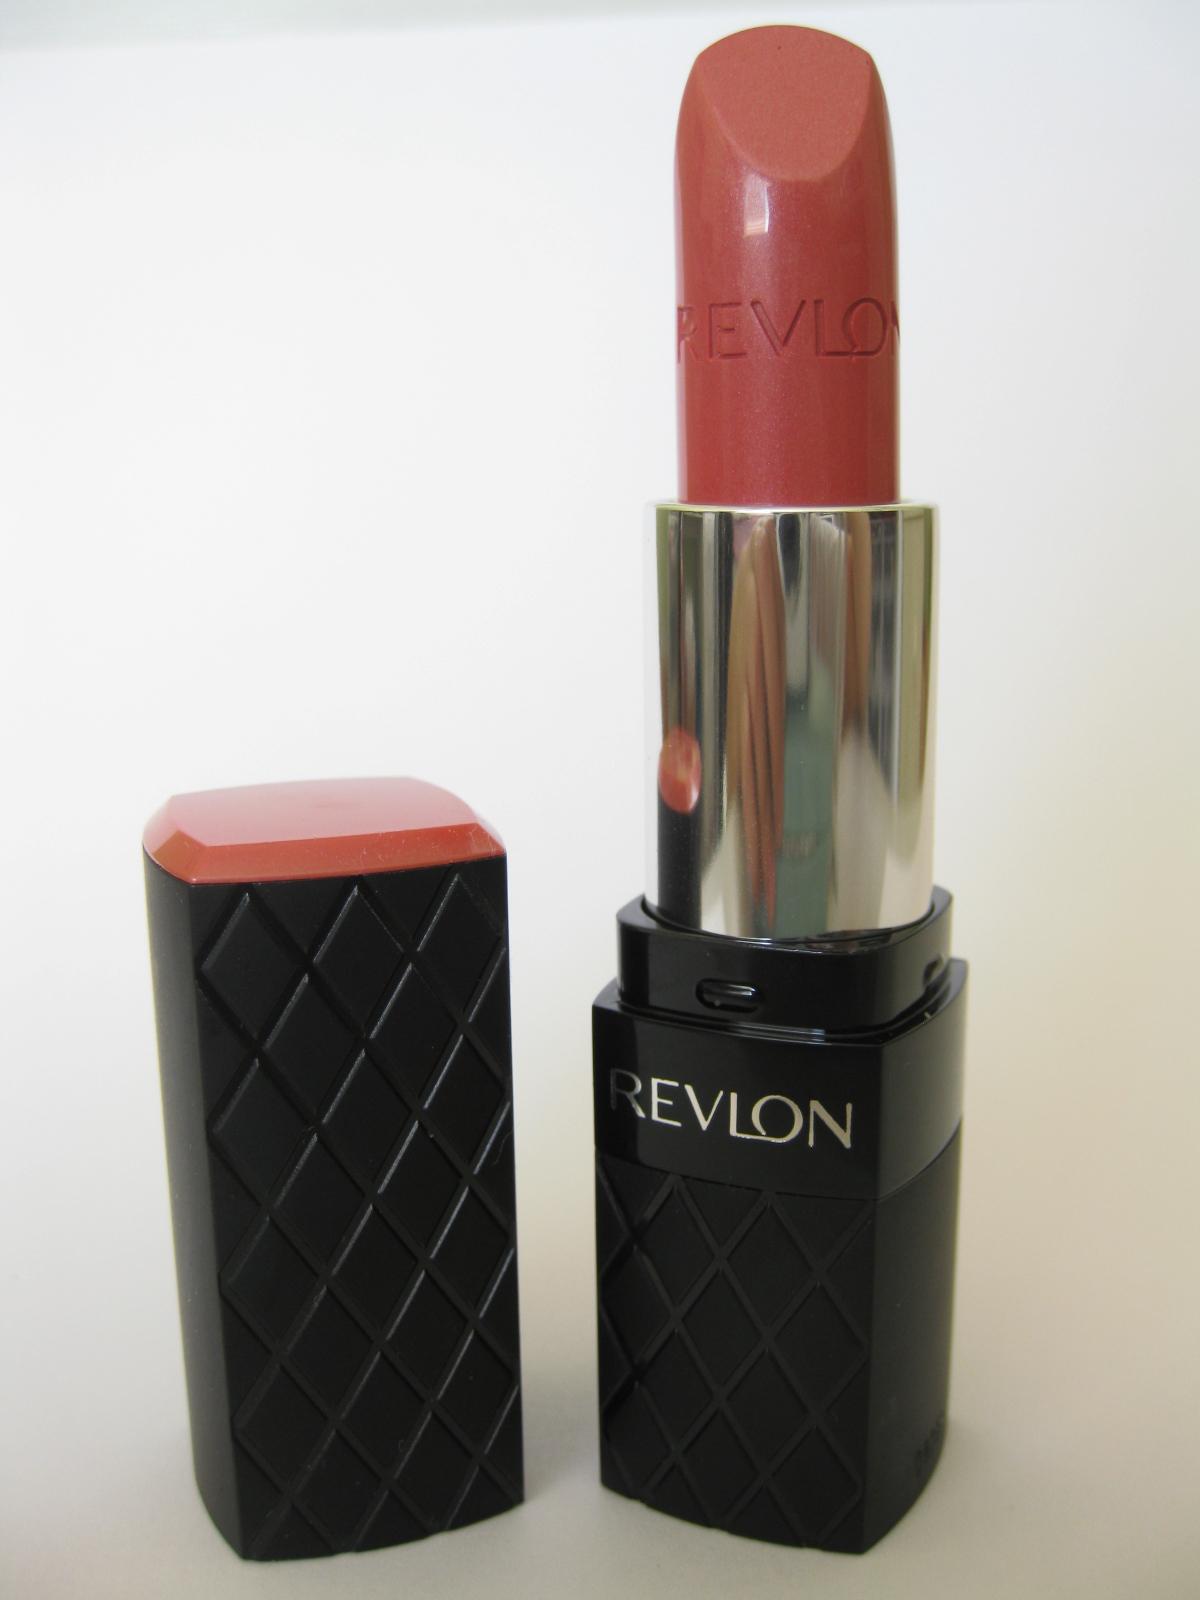 Kalifornia Love: Revlon ColorBurst Lipstick in Peach